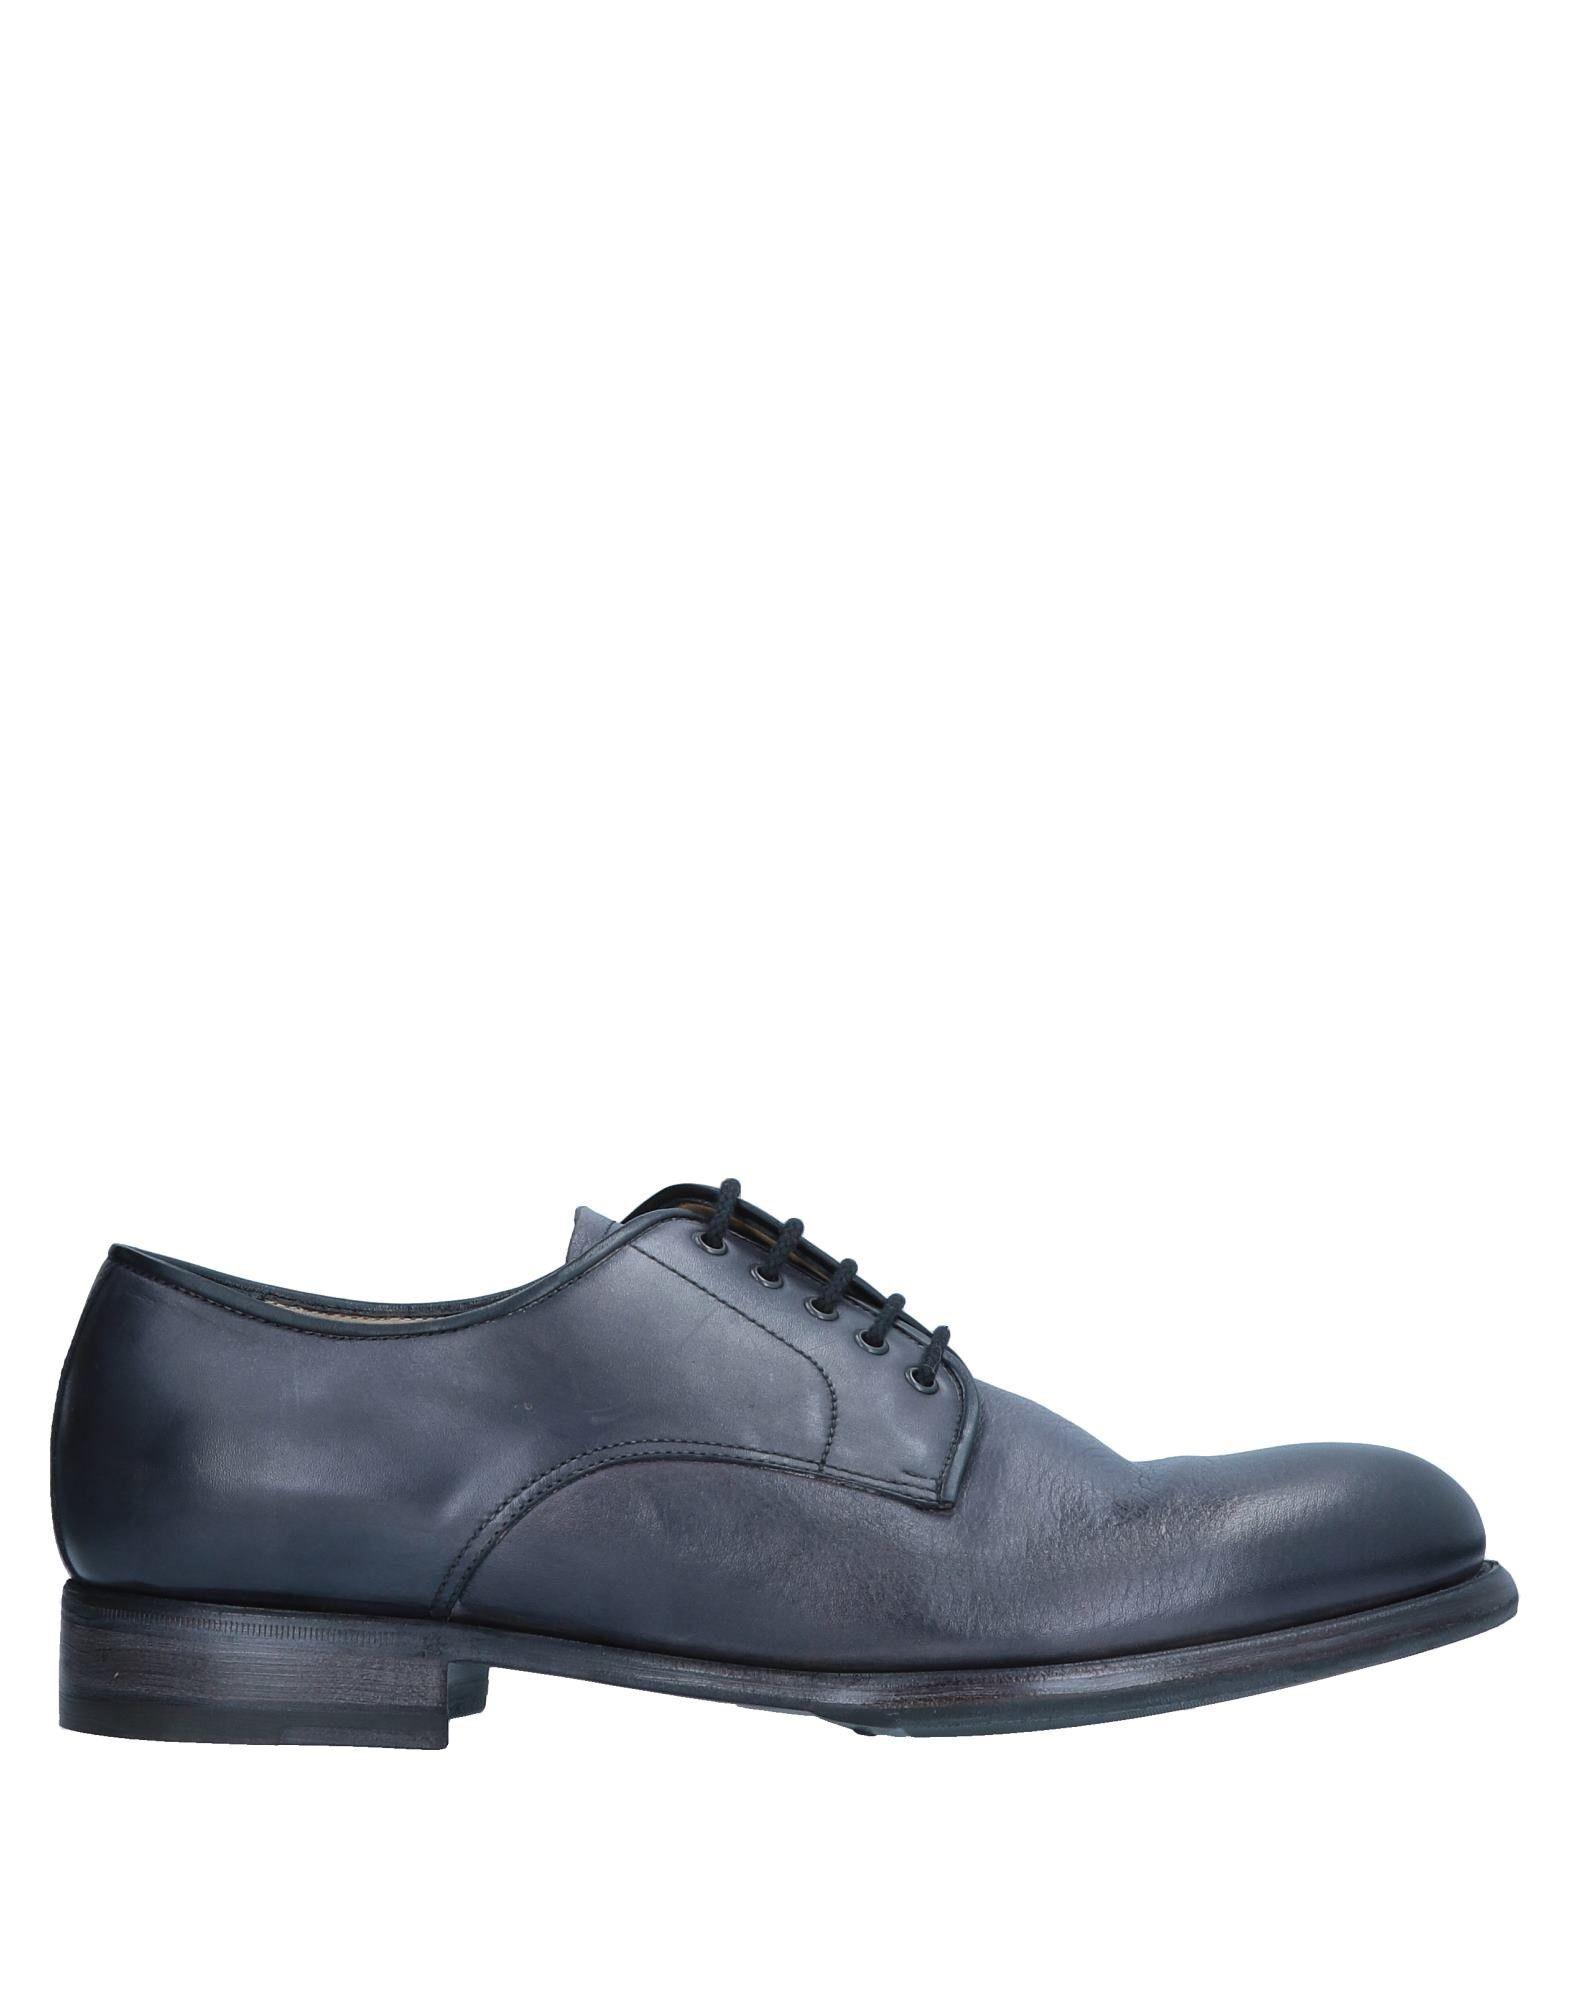 Barrett Schnürschuhe Herren  11548182JT Gute Qualität beliebte Schuhe